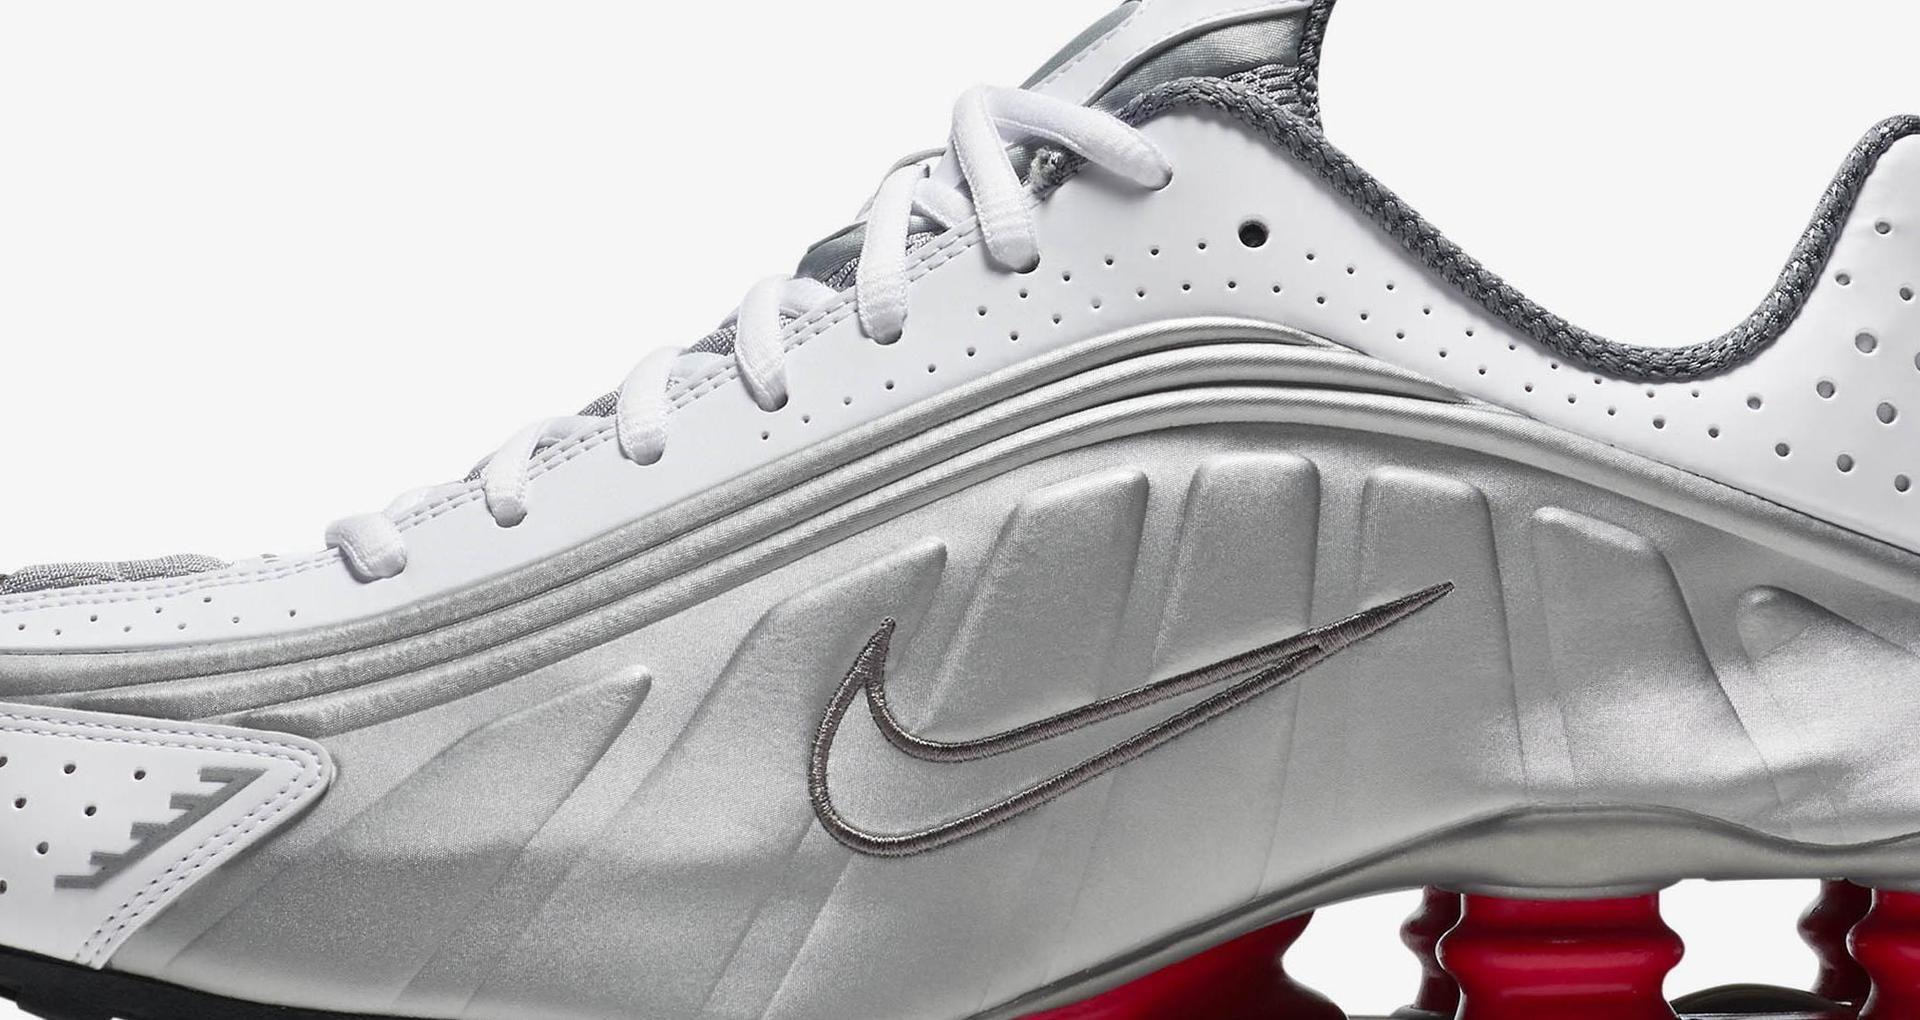 best sneakers 4b9b3 c36a5 Nike Shox R4  White   Comet Red   Metallic Silver  Release Date